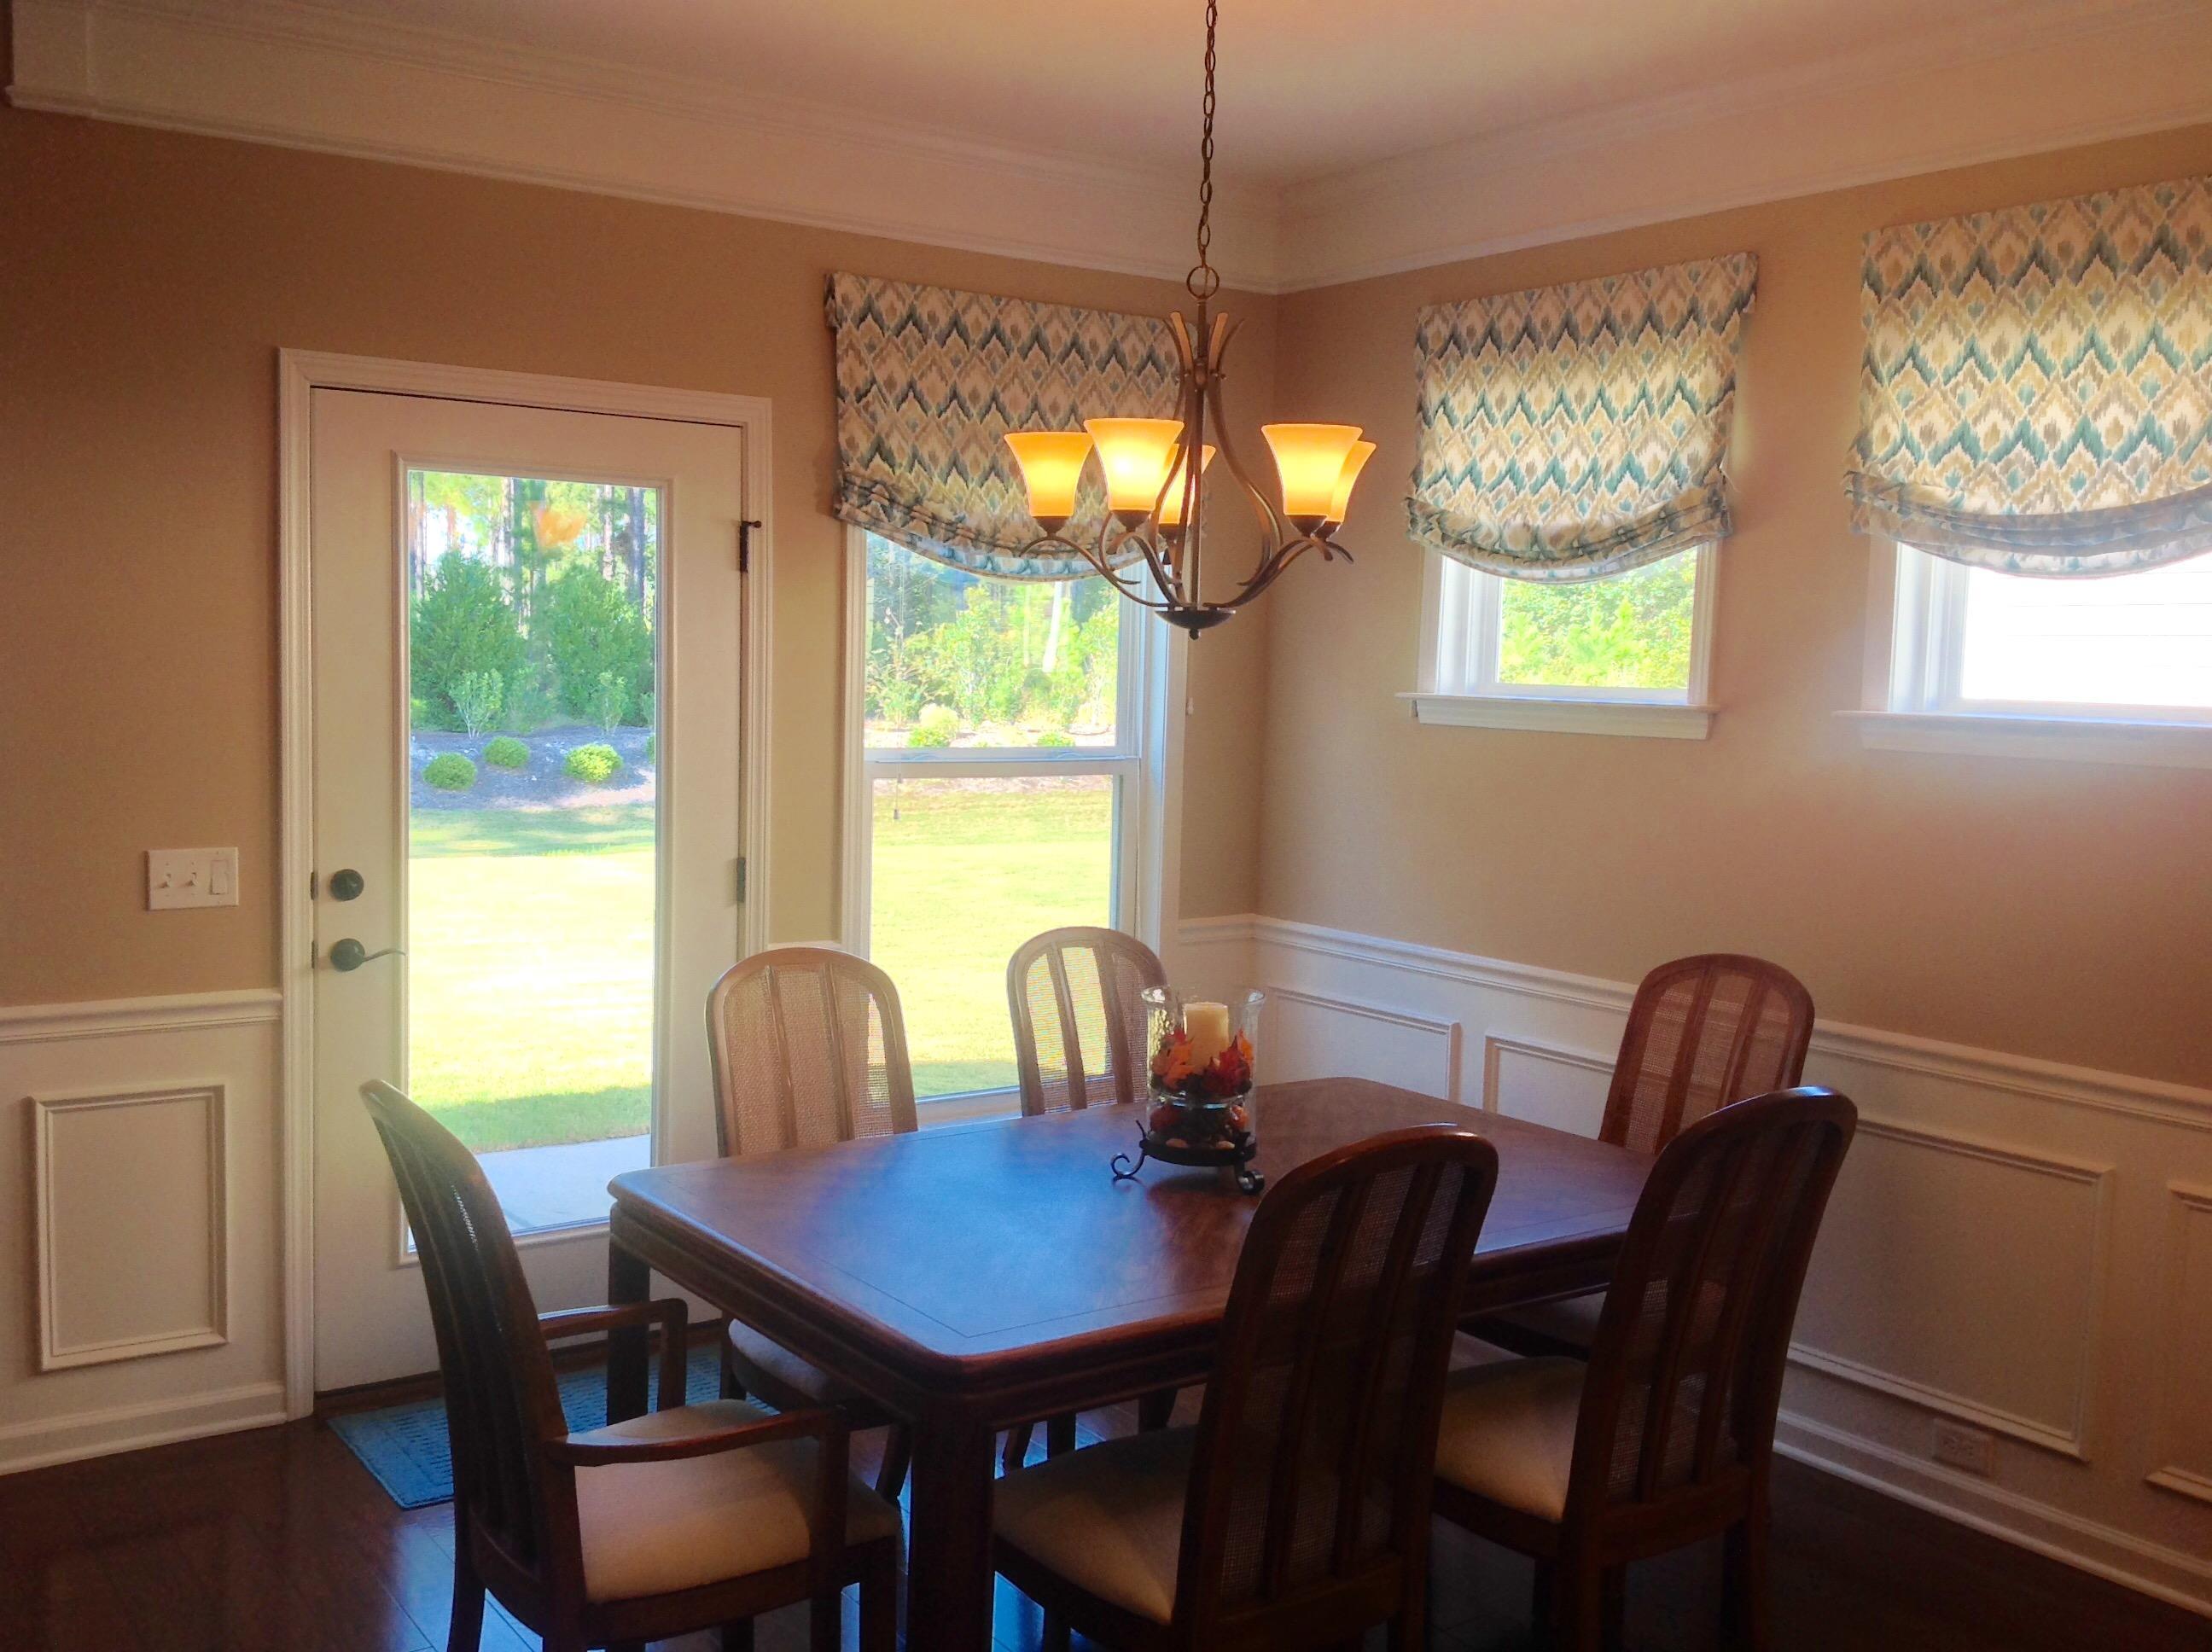 Cane Bay Plantation Homes For Sale - 547 Eastern Isle, Summerville, SC - 6